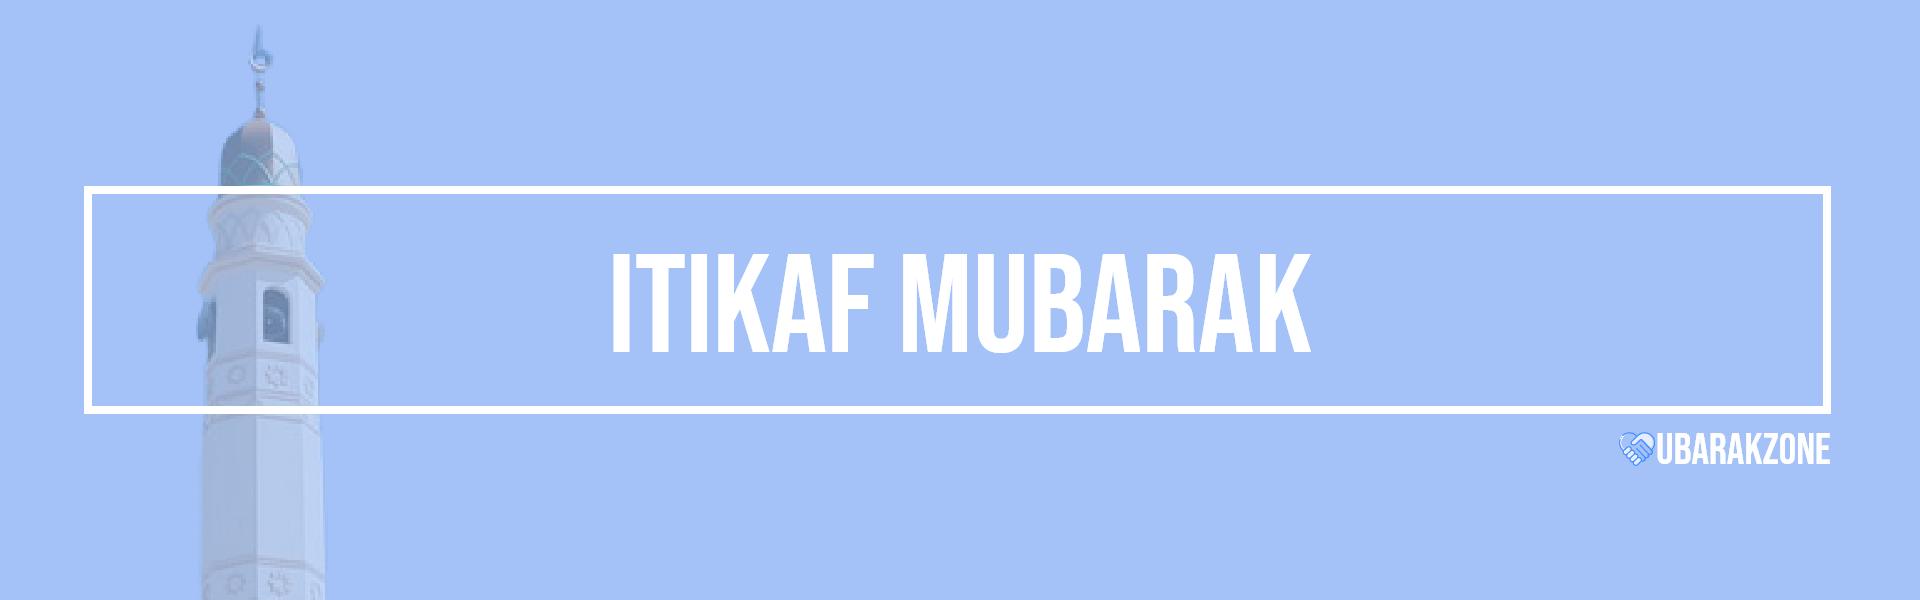 itikaf mubarak wishes messages